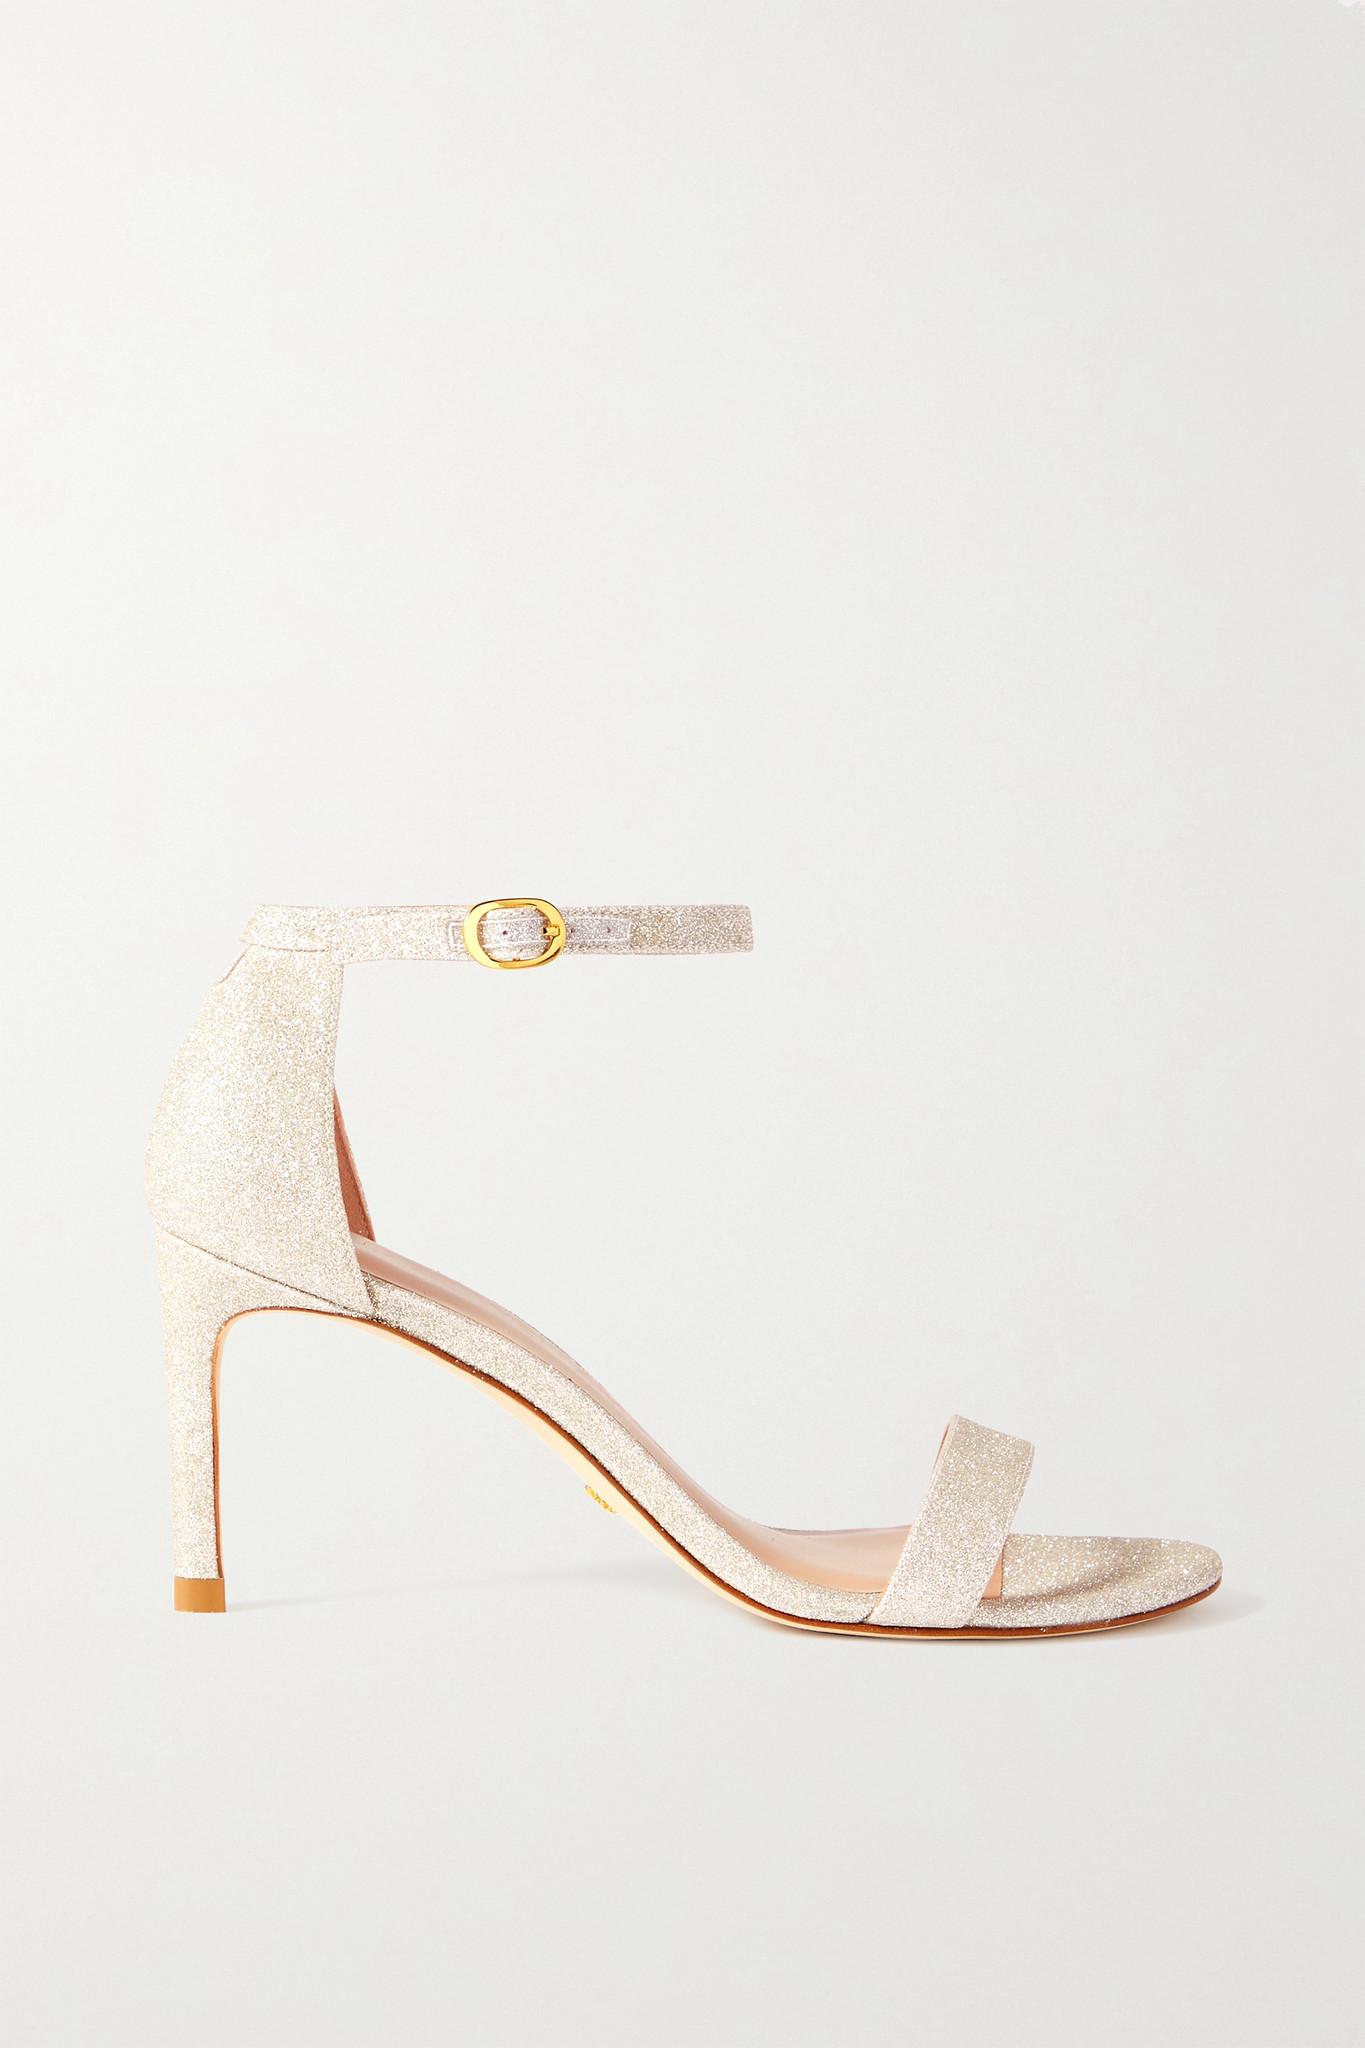 STUART WEITZMAN - Nunaked Glittered Leather Sandals - Gold - US7